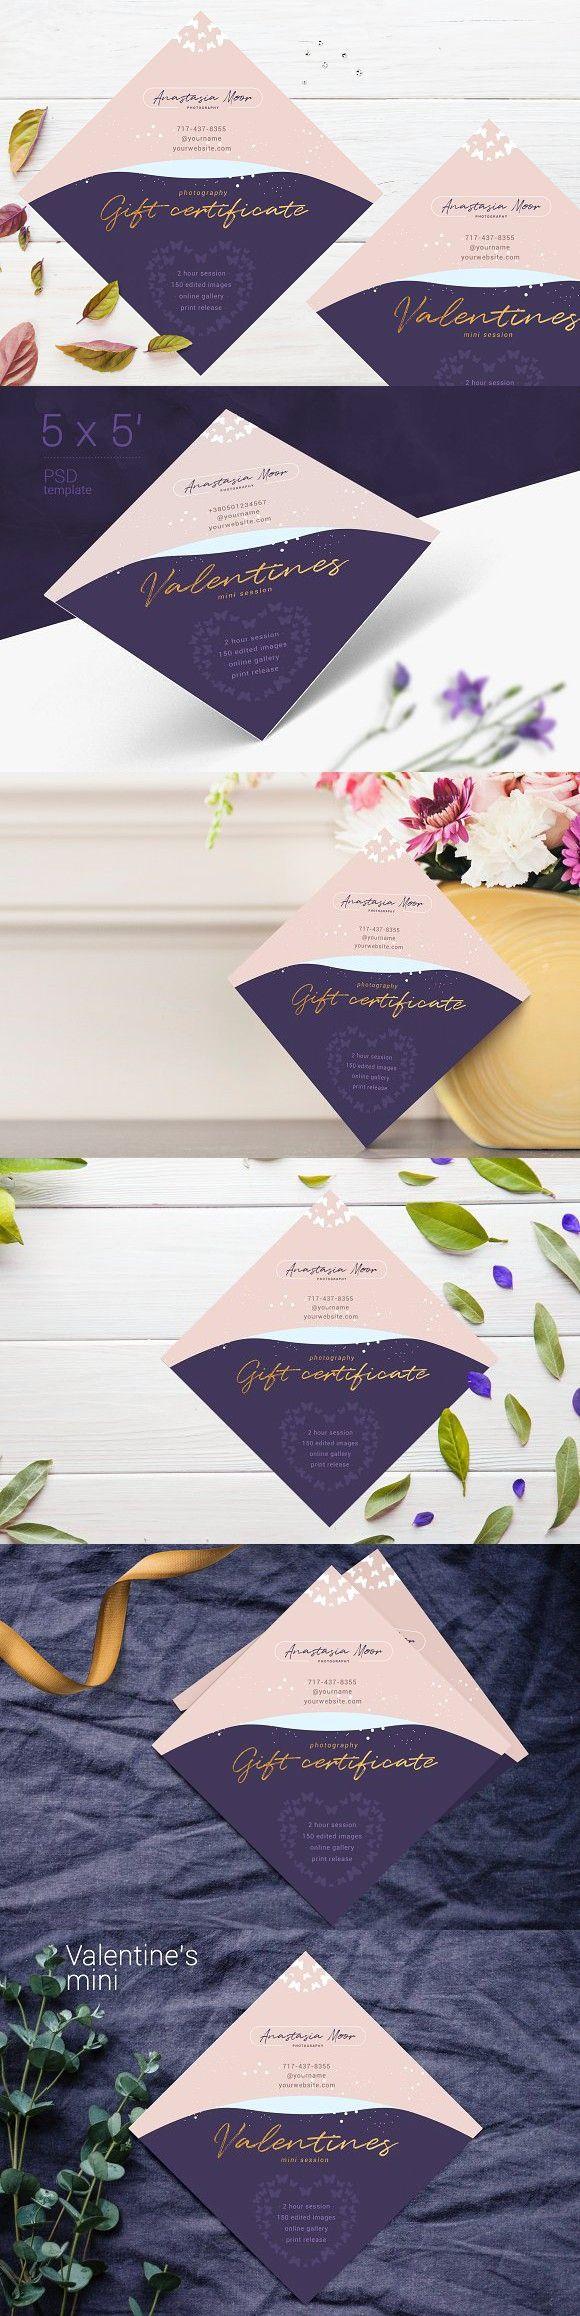 Purple Gift Certificate Template #giftcertificate #giftvoucher